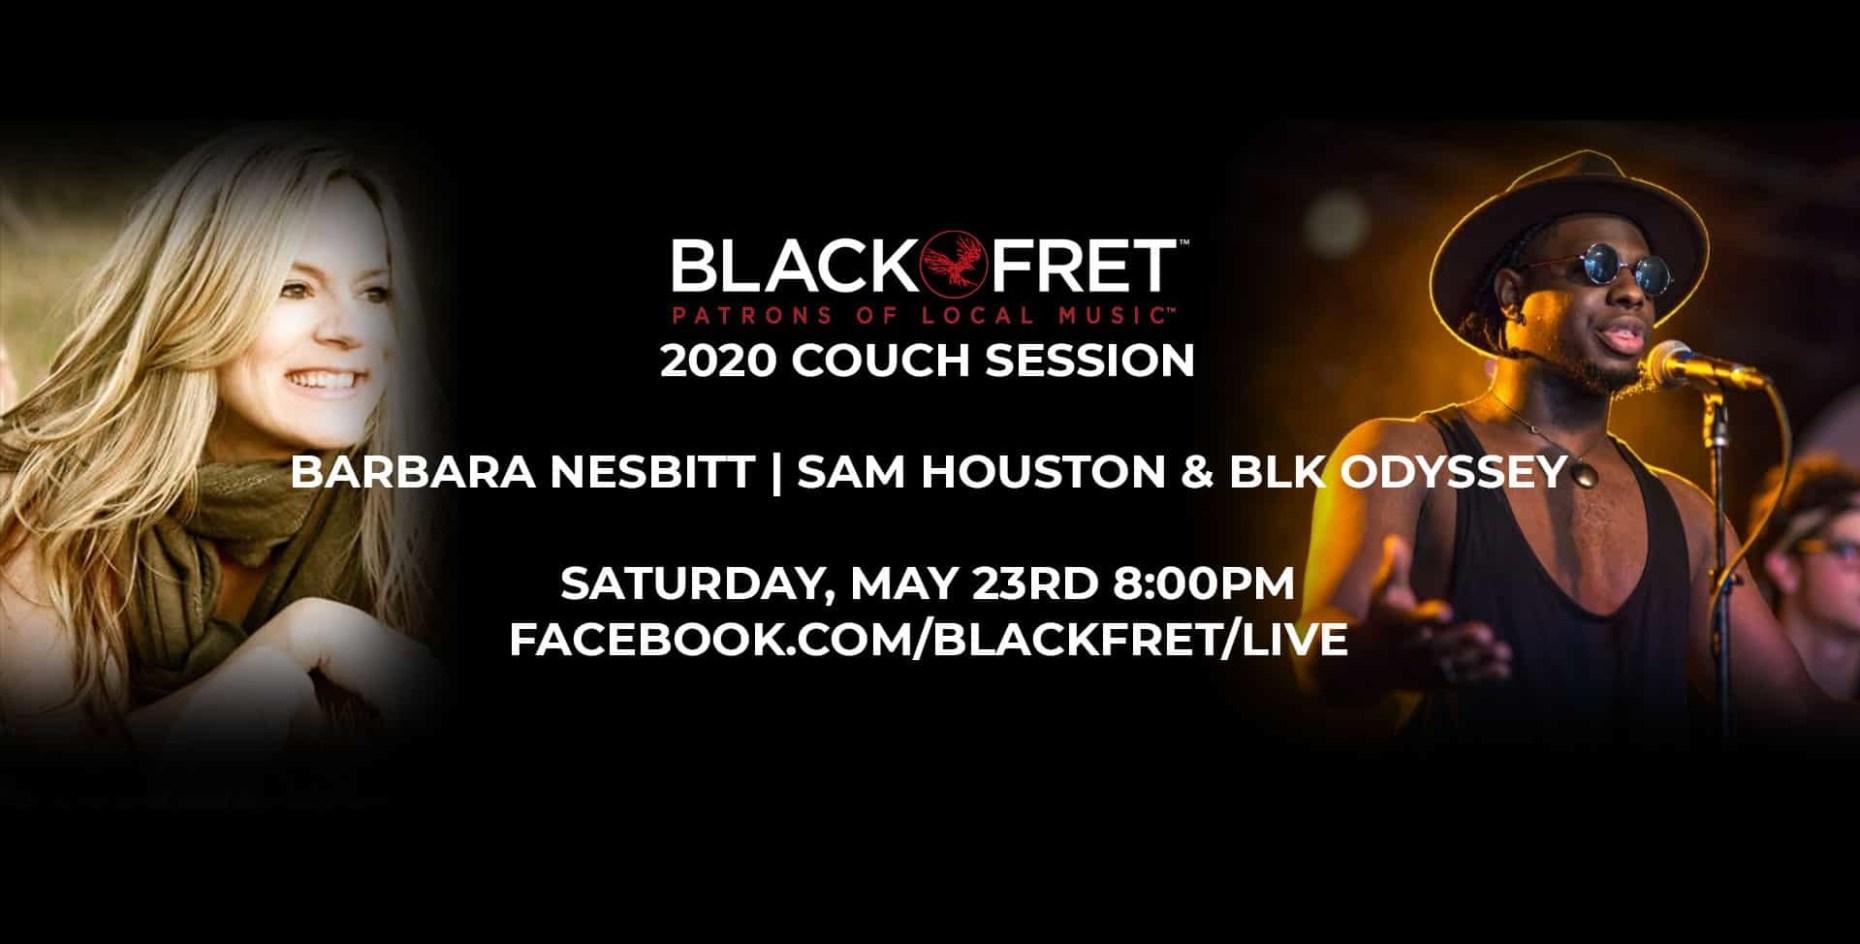 Black Fret Event